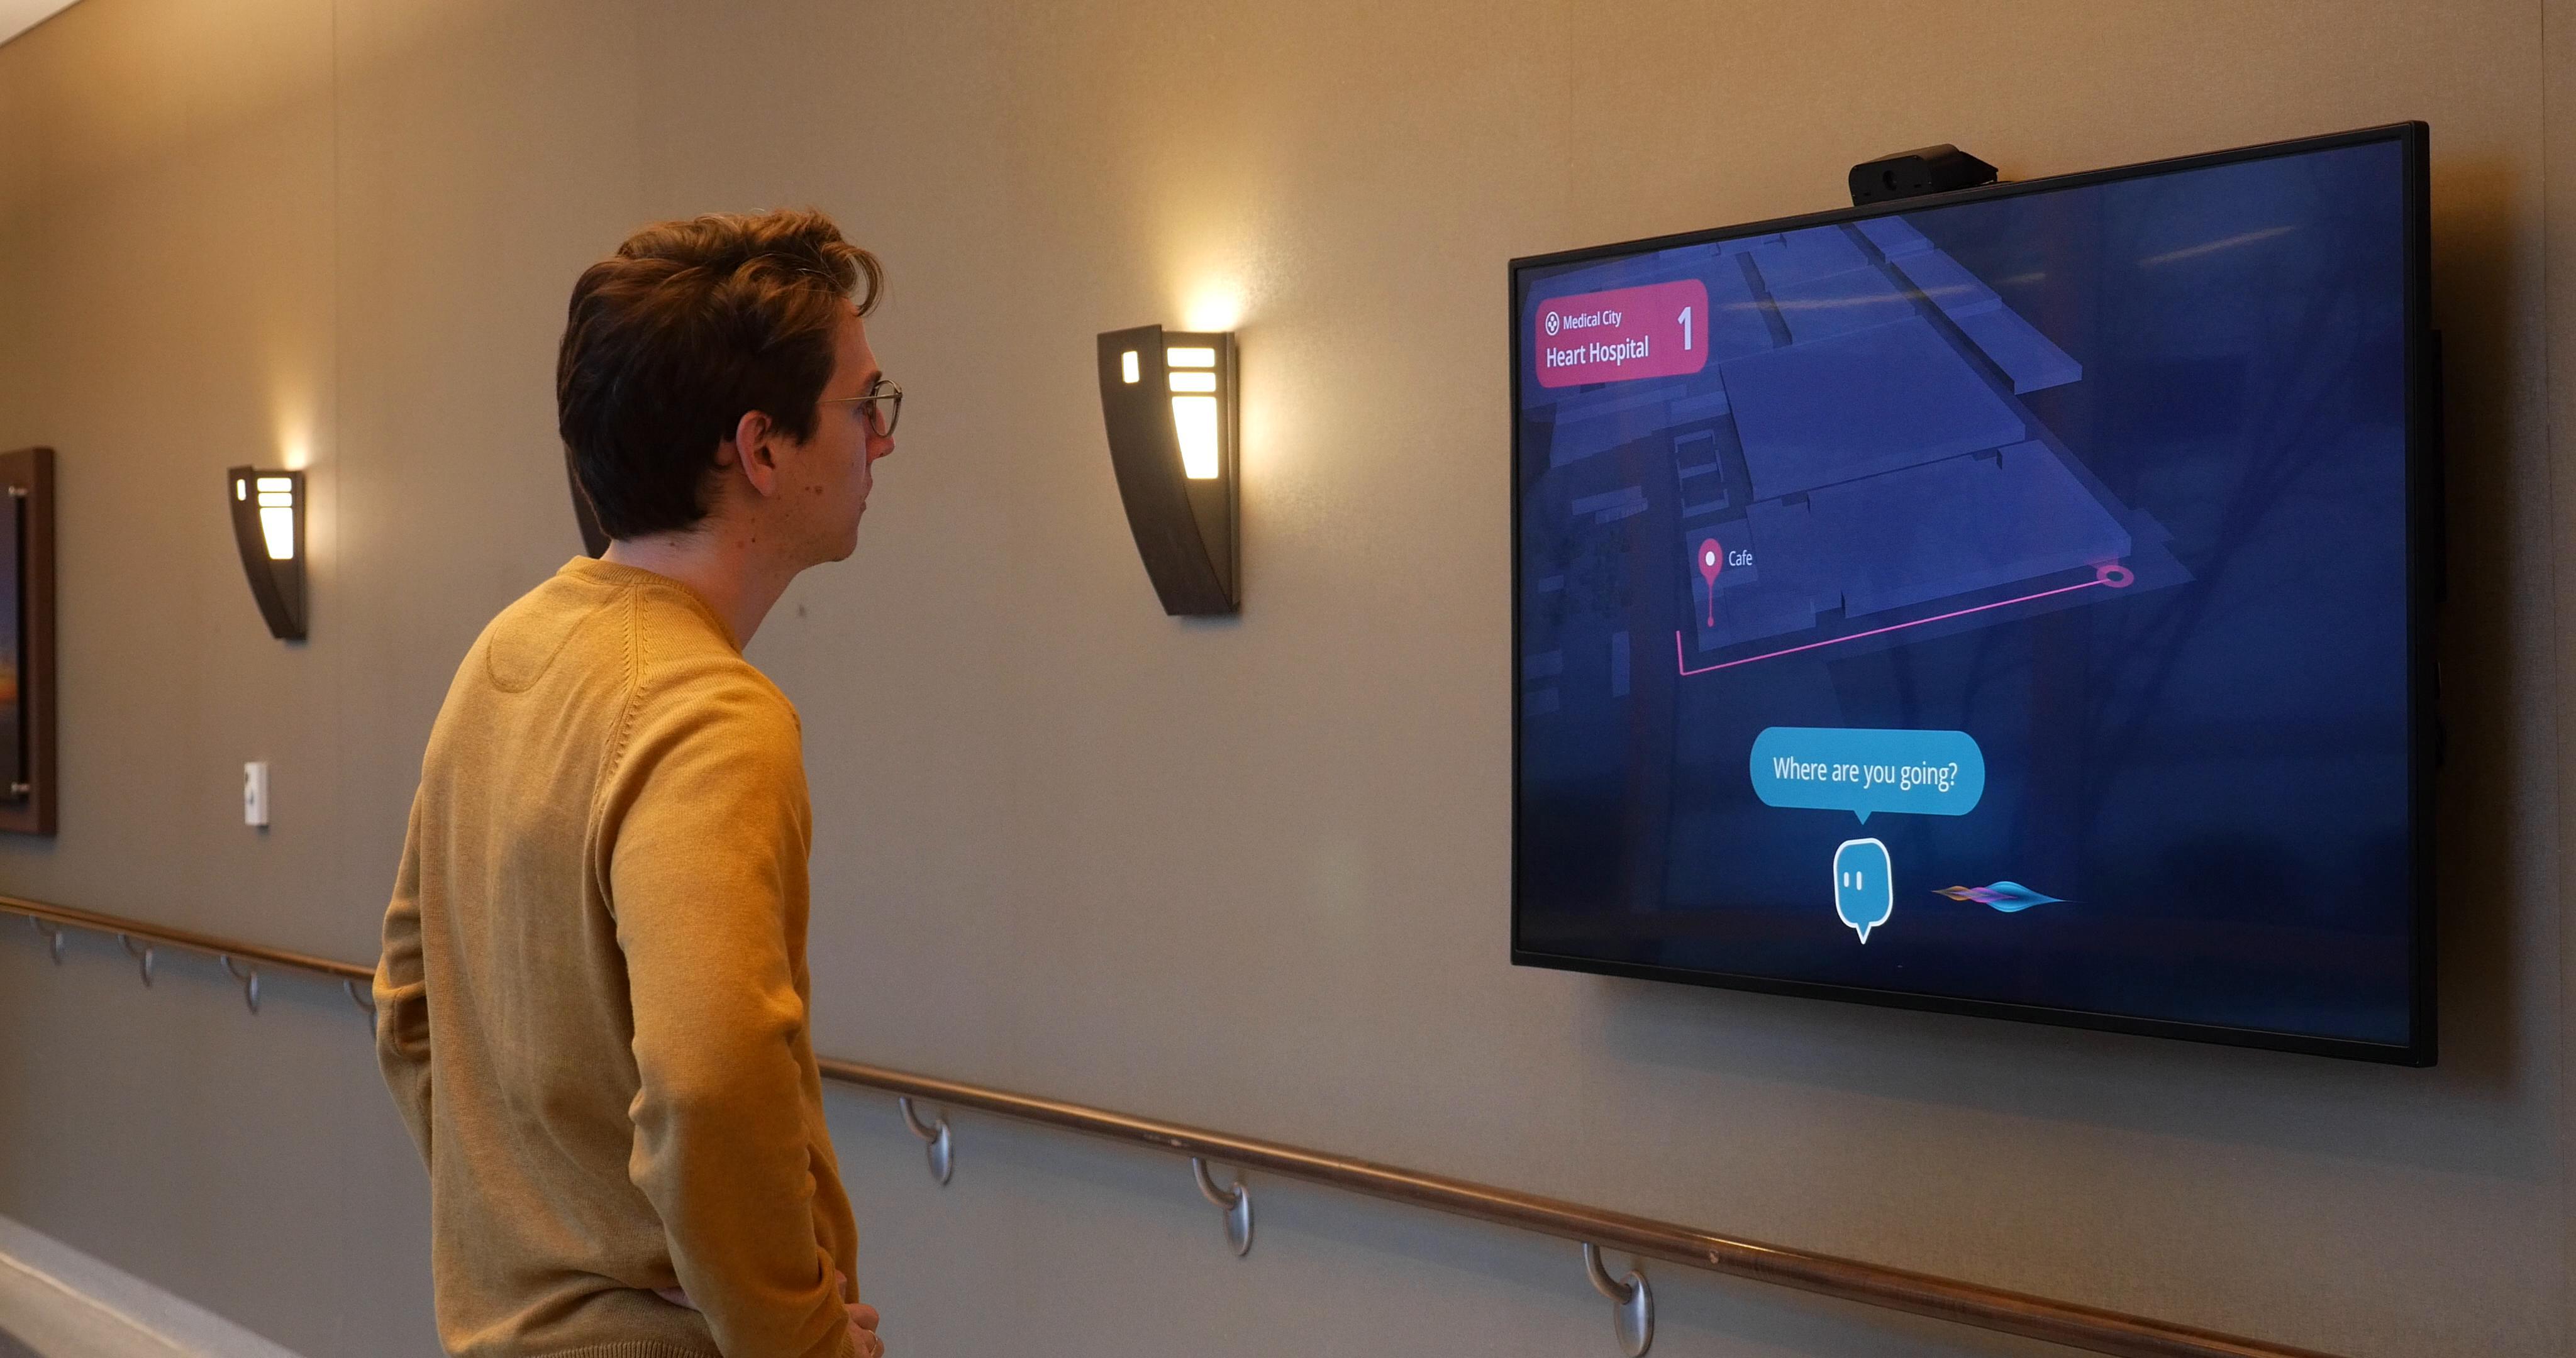 Visitor looking at interactive screen showing wayfinding directions at Medical City Heart Hospital.